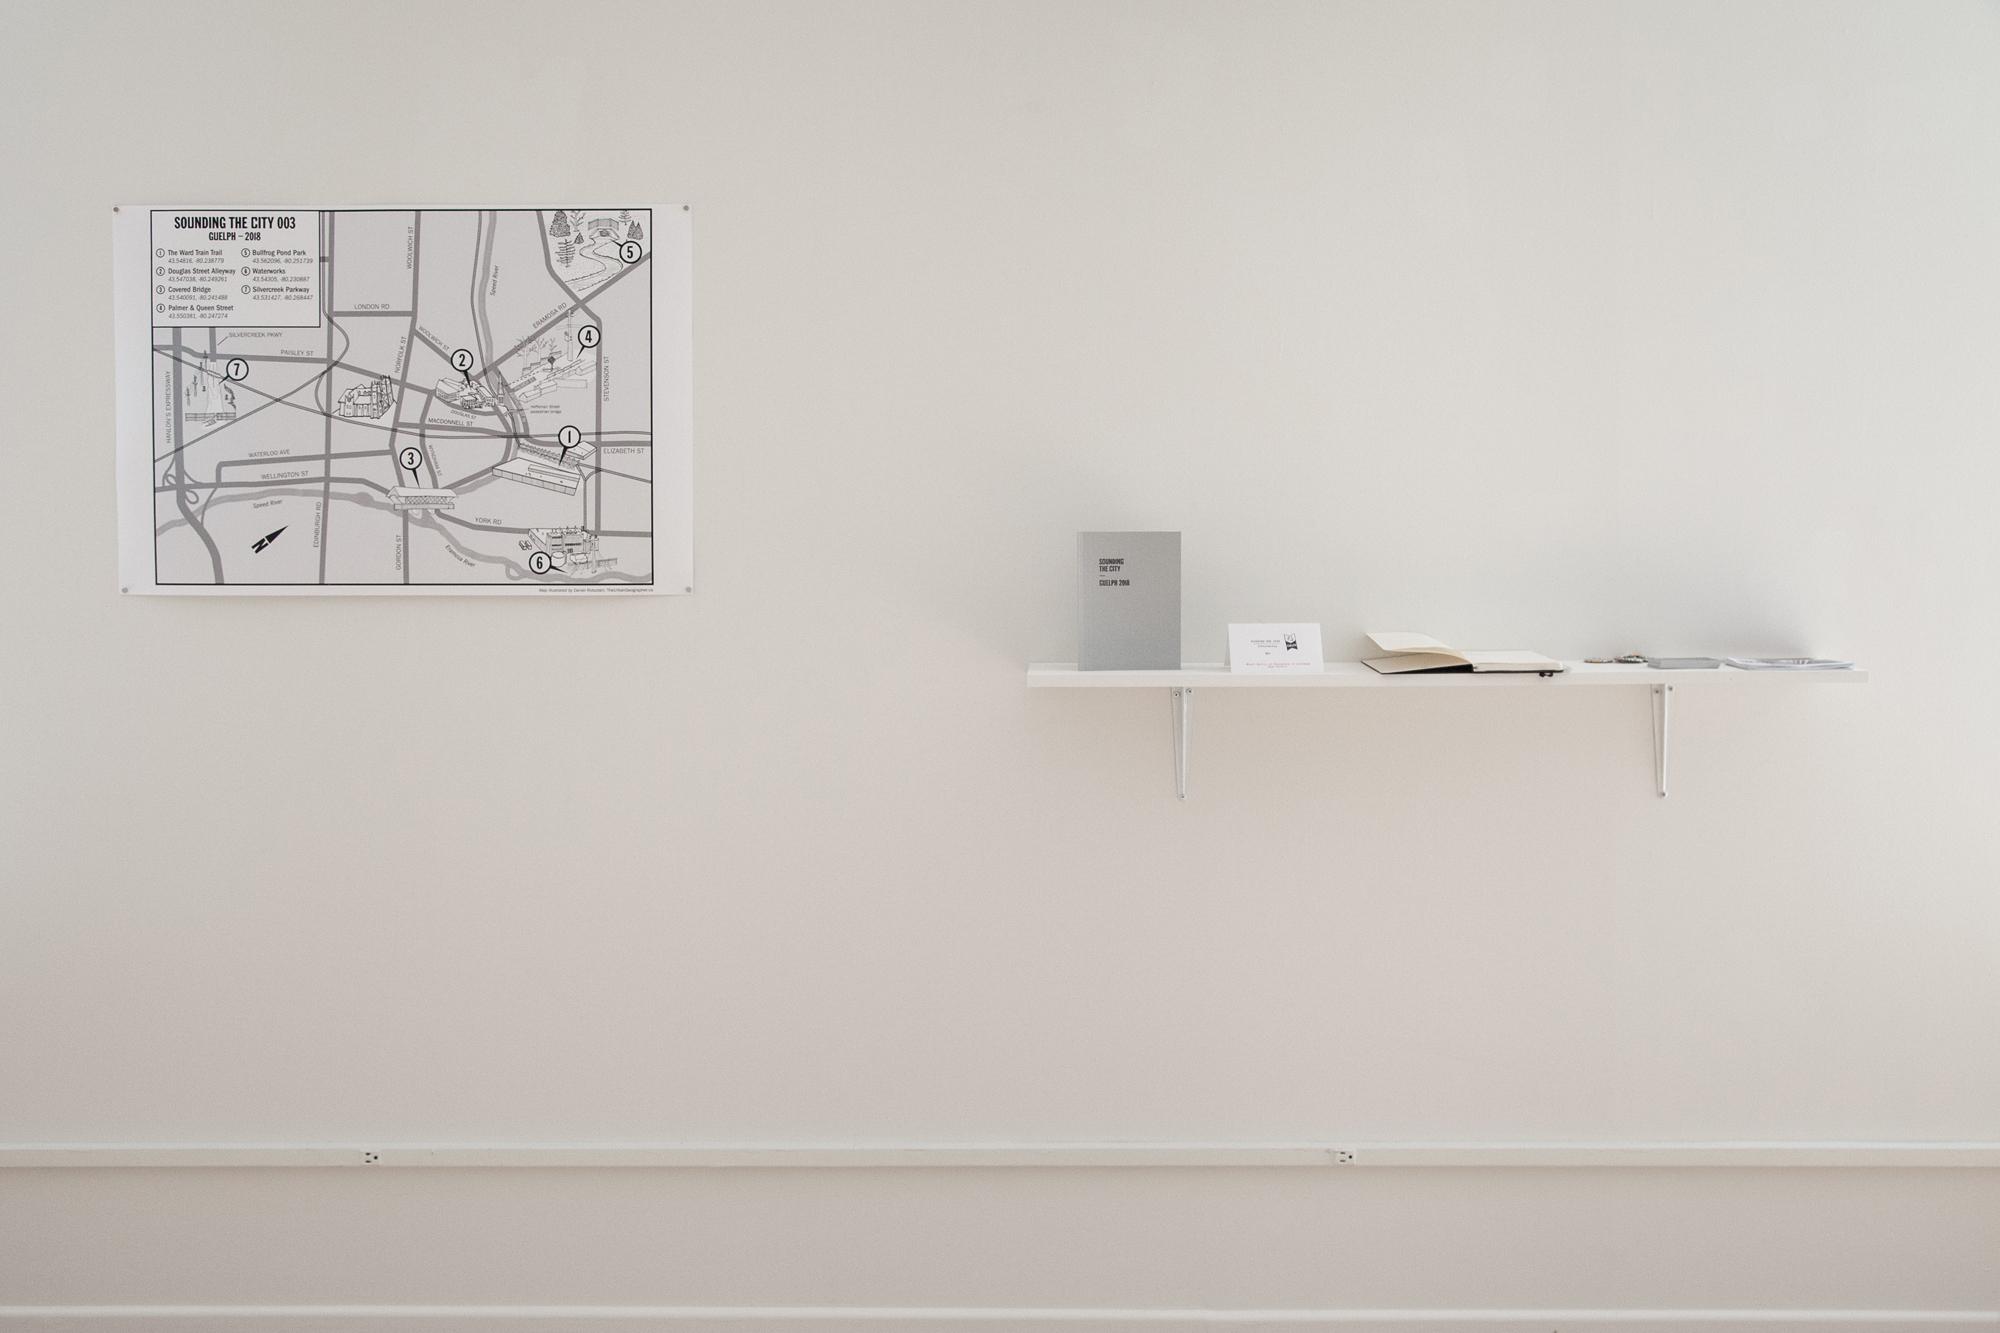 Exhibition photo 3 - Sounding the City 003 - Guelph 2018